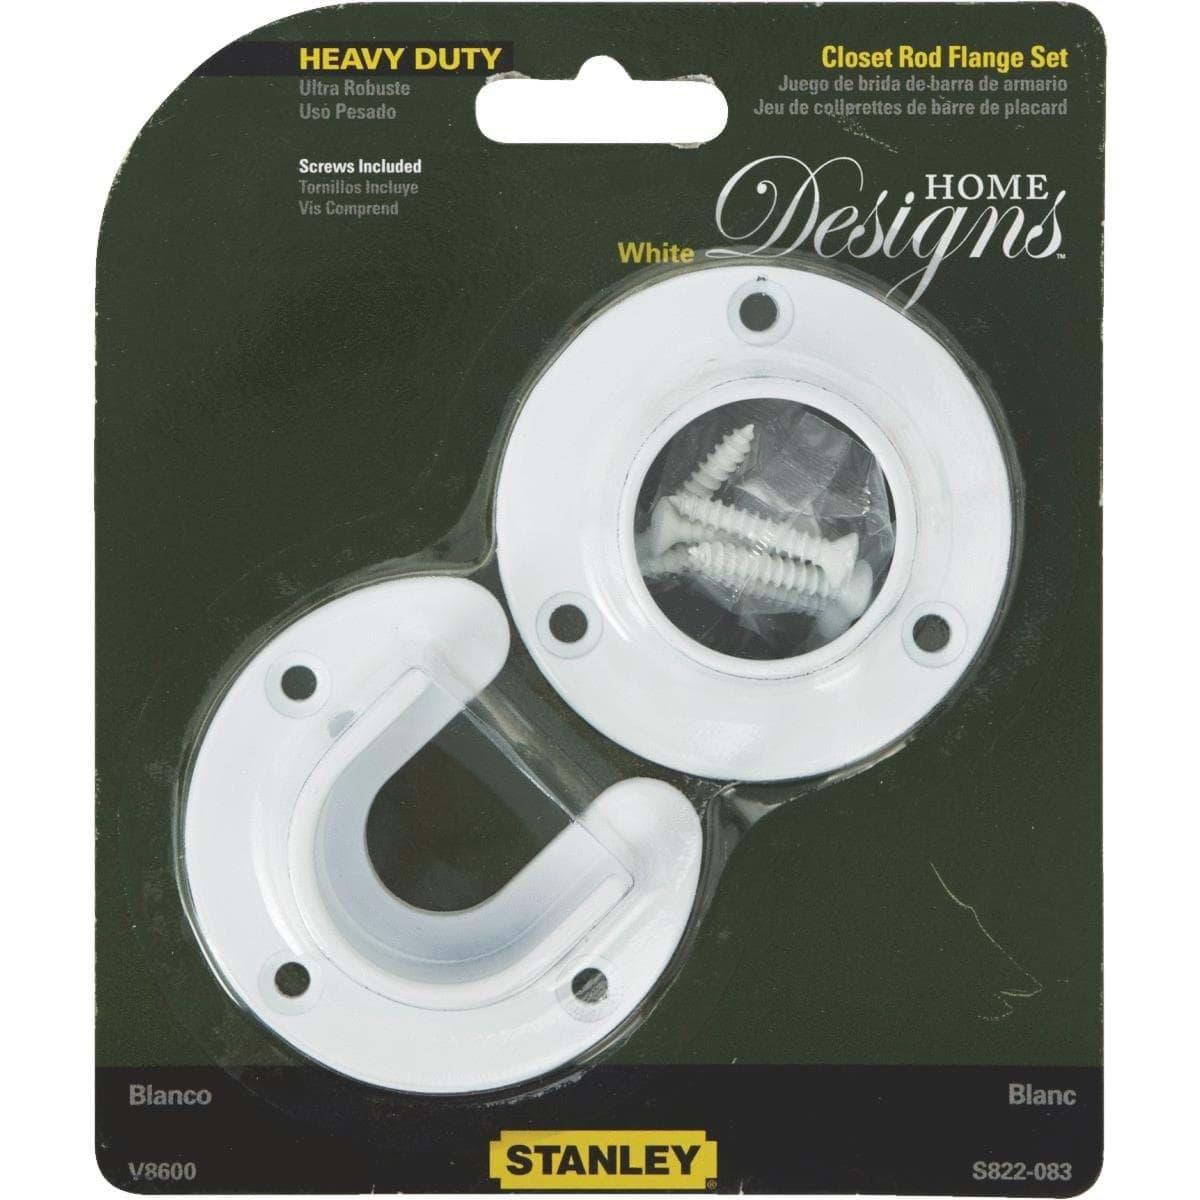 Ropesoapndope Stanley Home Designs Closet Rod Socket